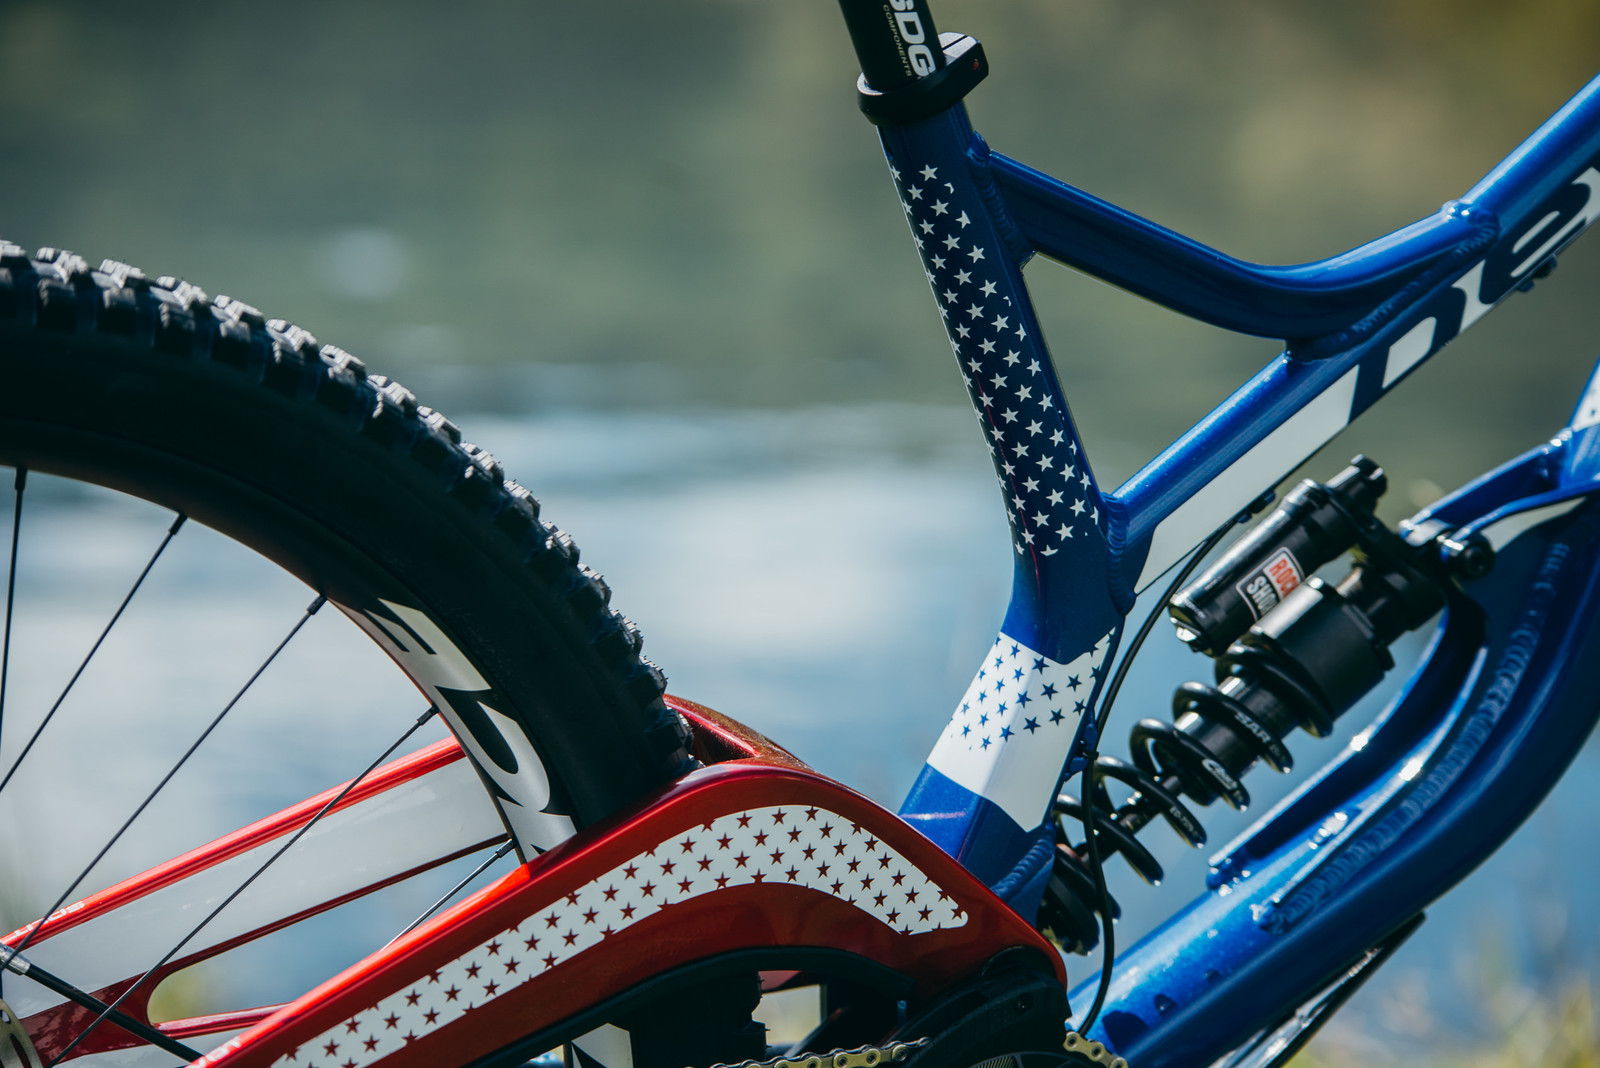 Carbon Meets Alloy - WORLD CHAMPS BIKES - Unior/Devinci Factory Racing - Mountain Biking Pictures - Vital MTB